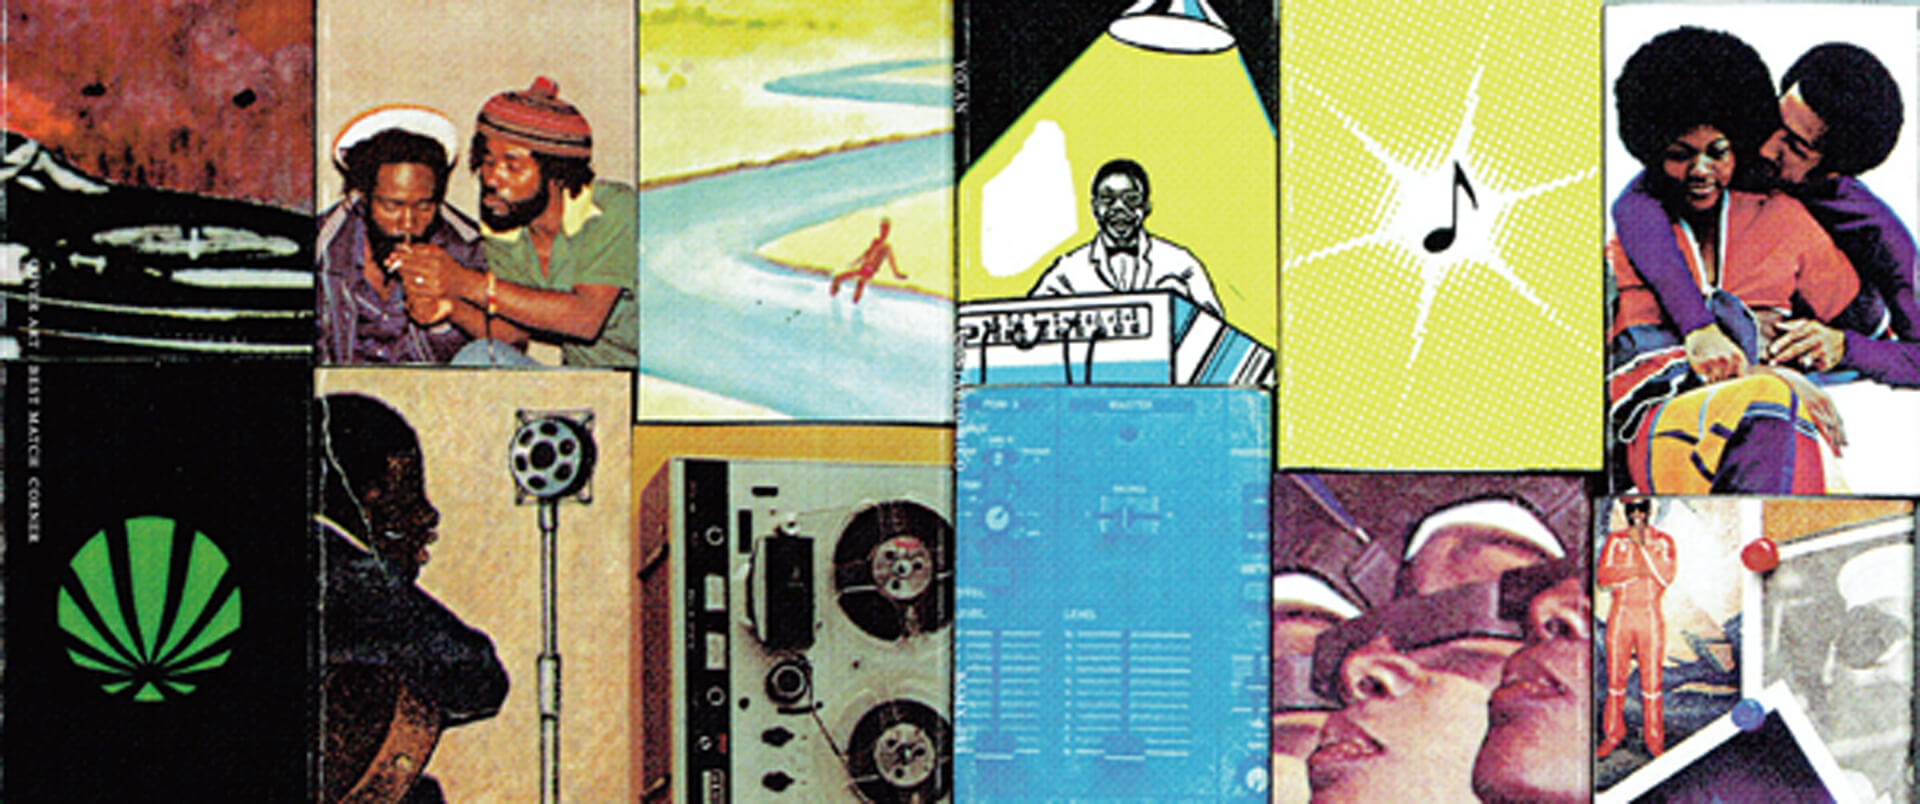 〈BLACK SMOKER RECORDS〉からYO.ANのMIX CD『CONTACTO RICO』が9月にリリース music200820-blacksmoker-yoan-2